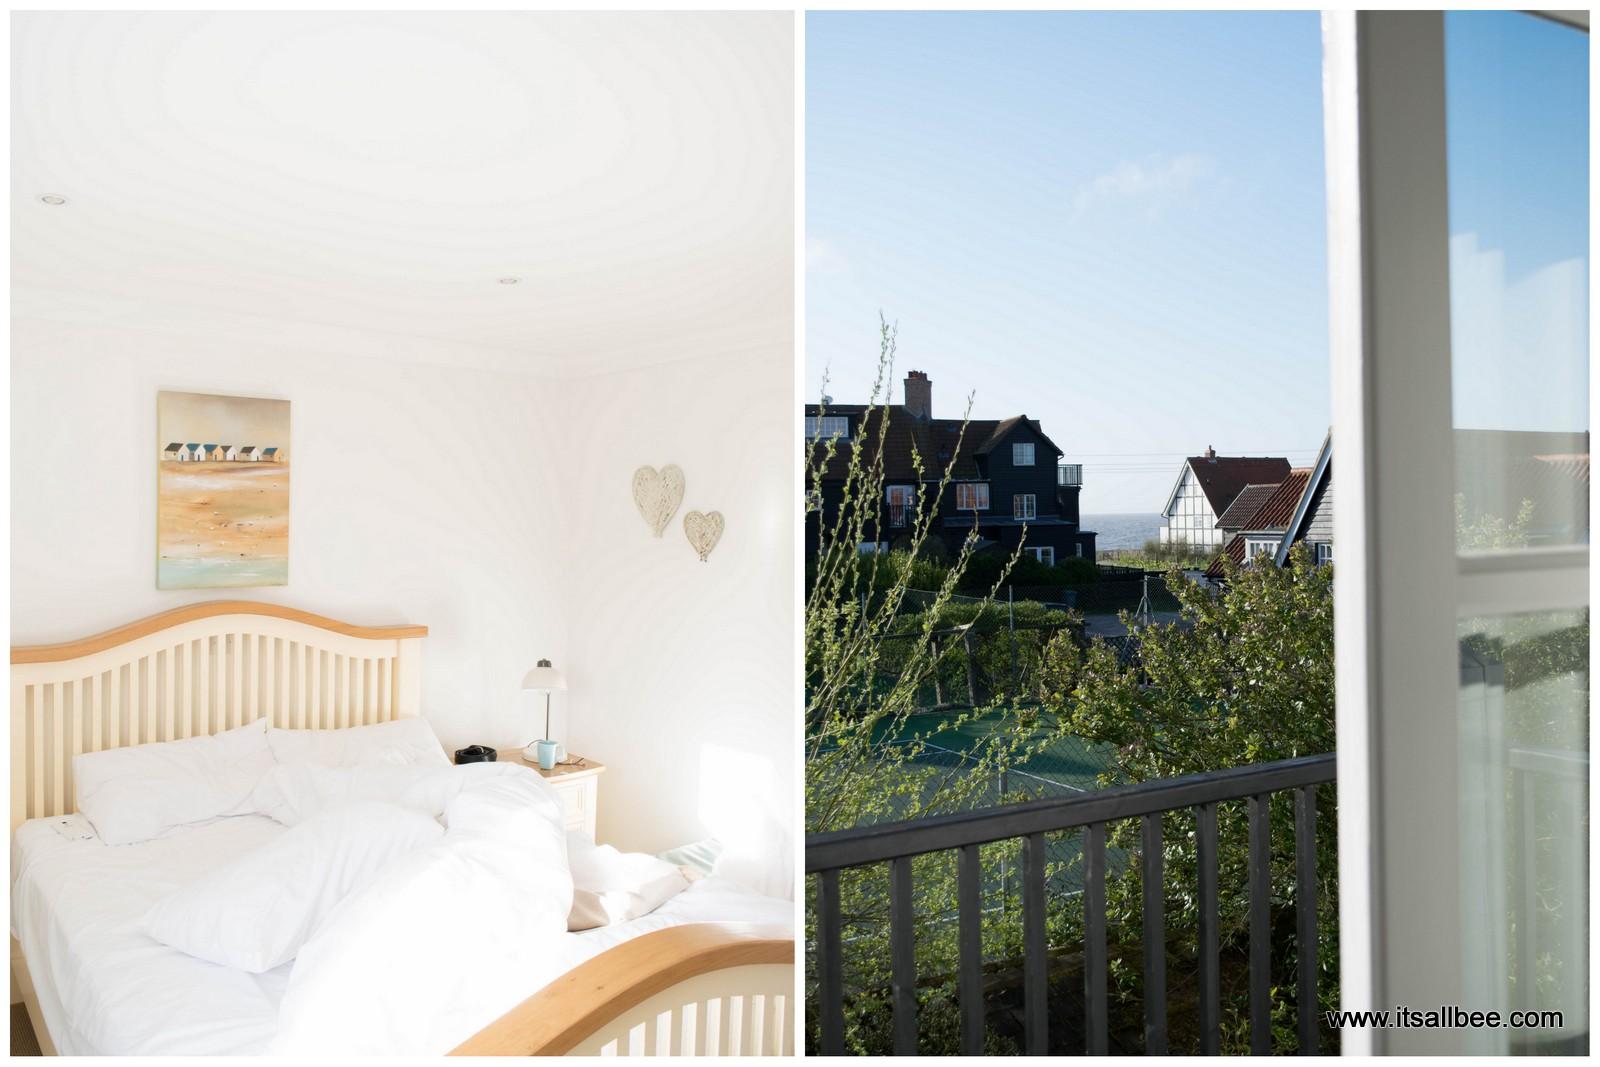 Thorpeness accommodation | Thorpeness village